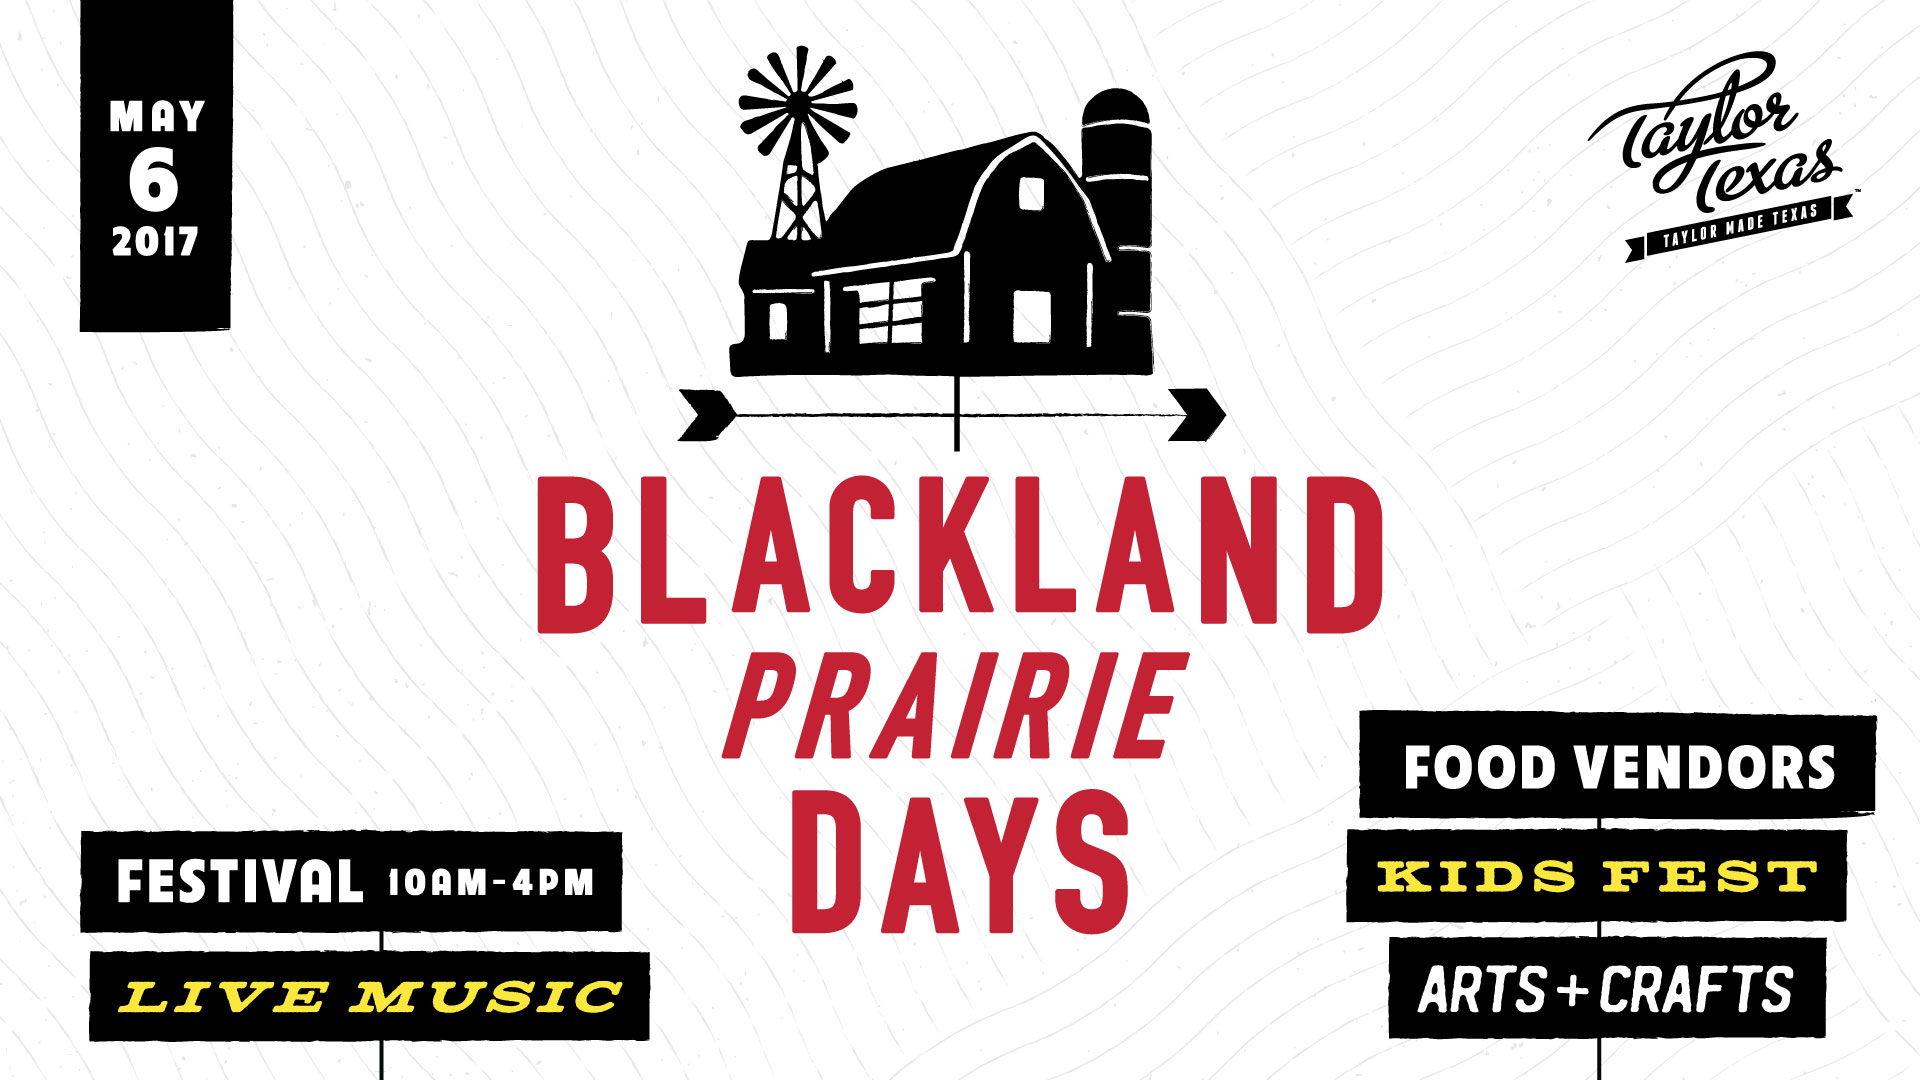 TAY_Blackland Prairie Days